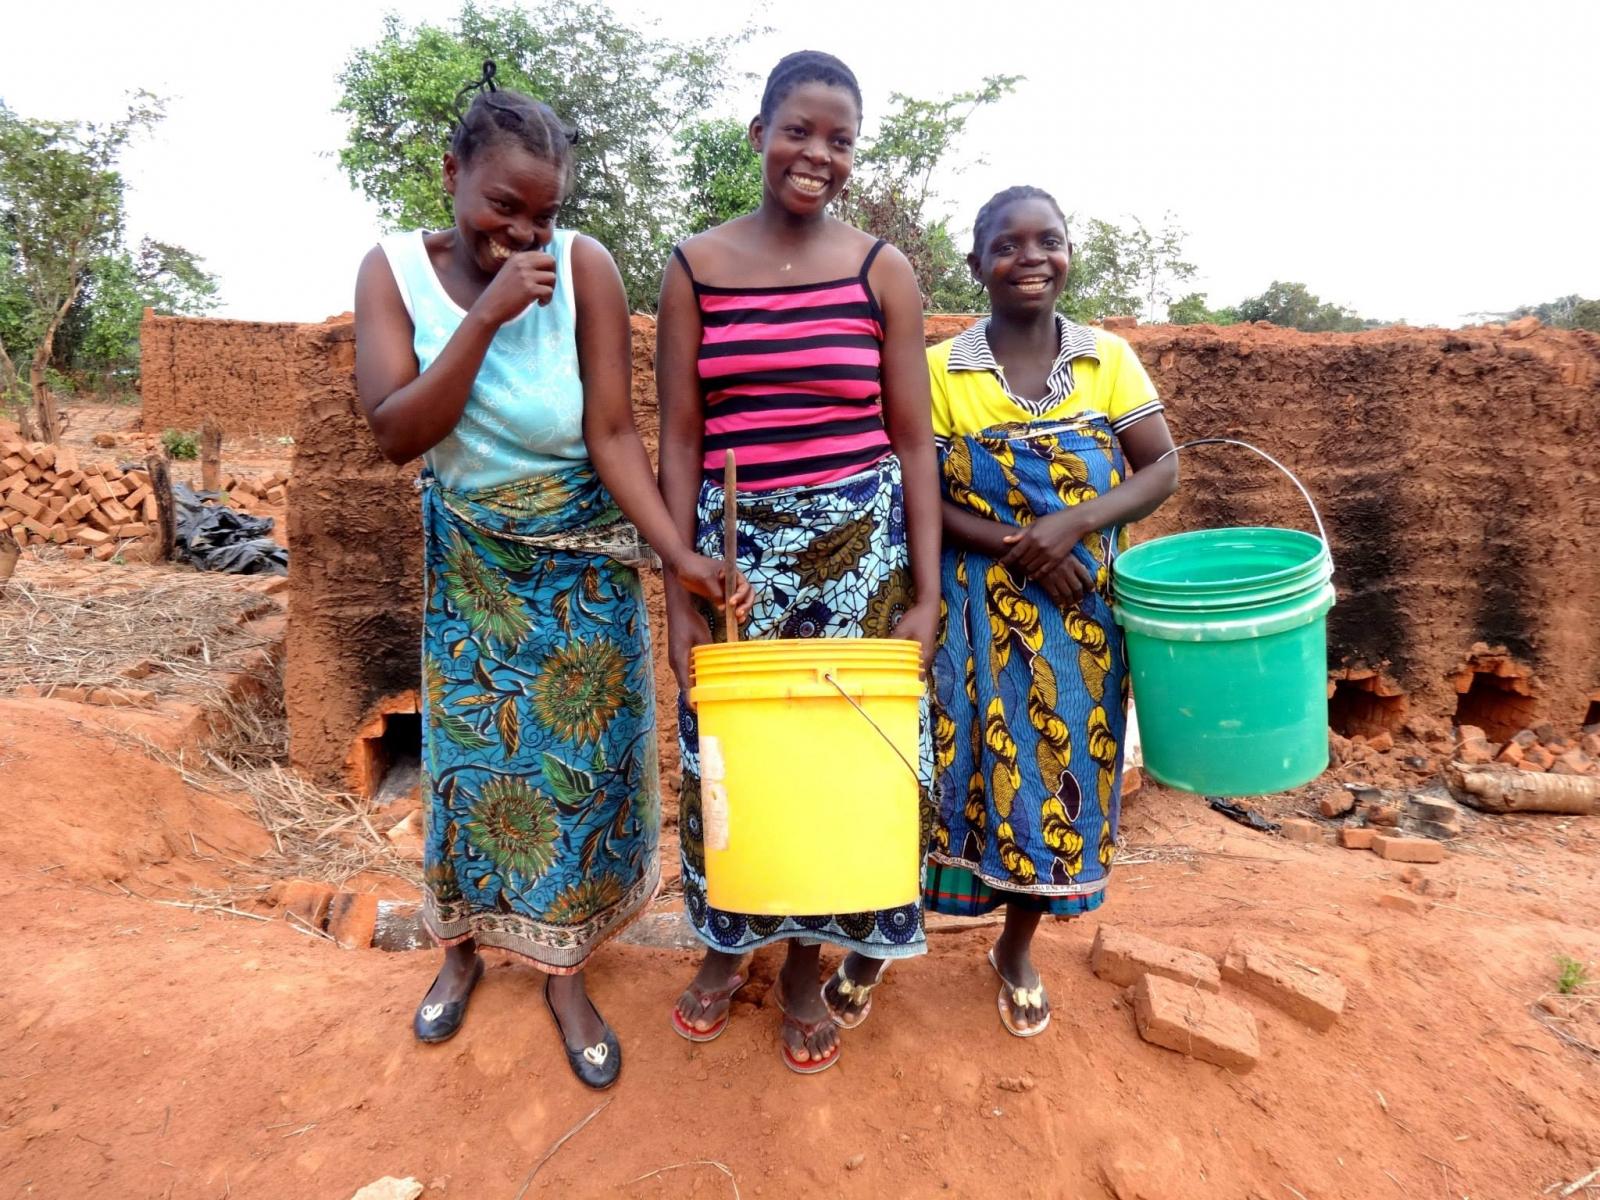 Girls in Malawi